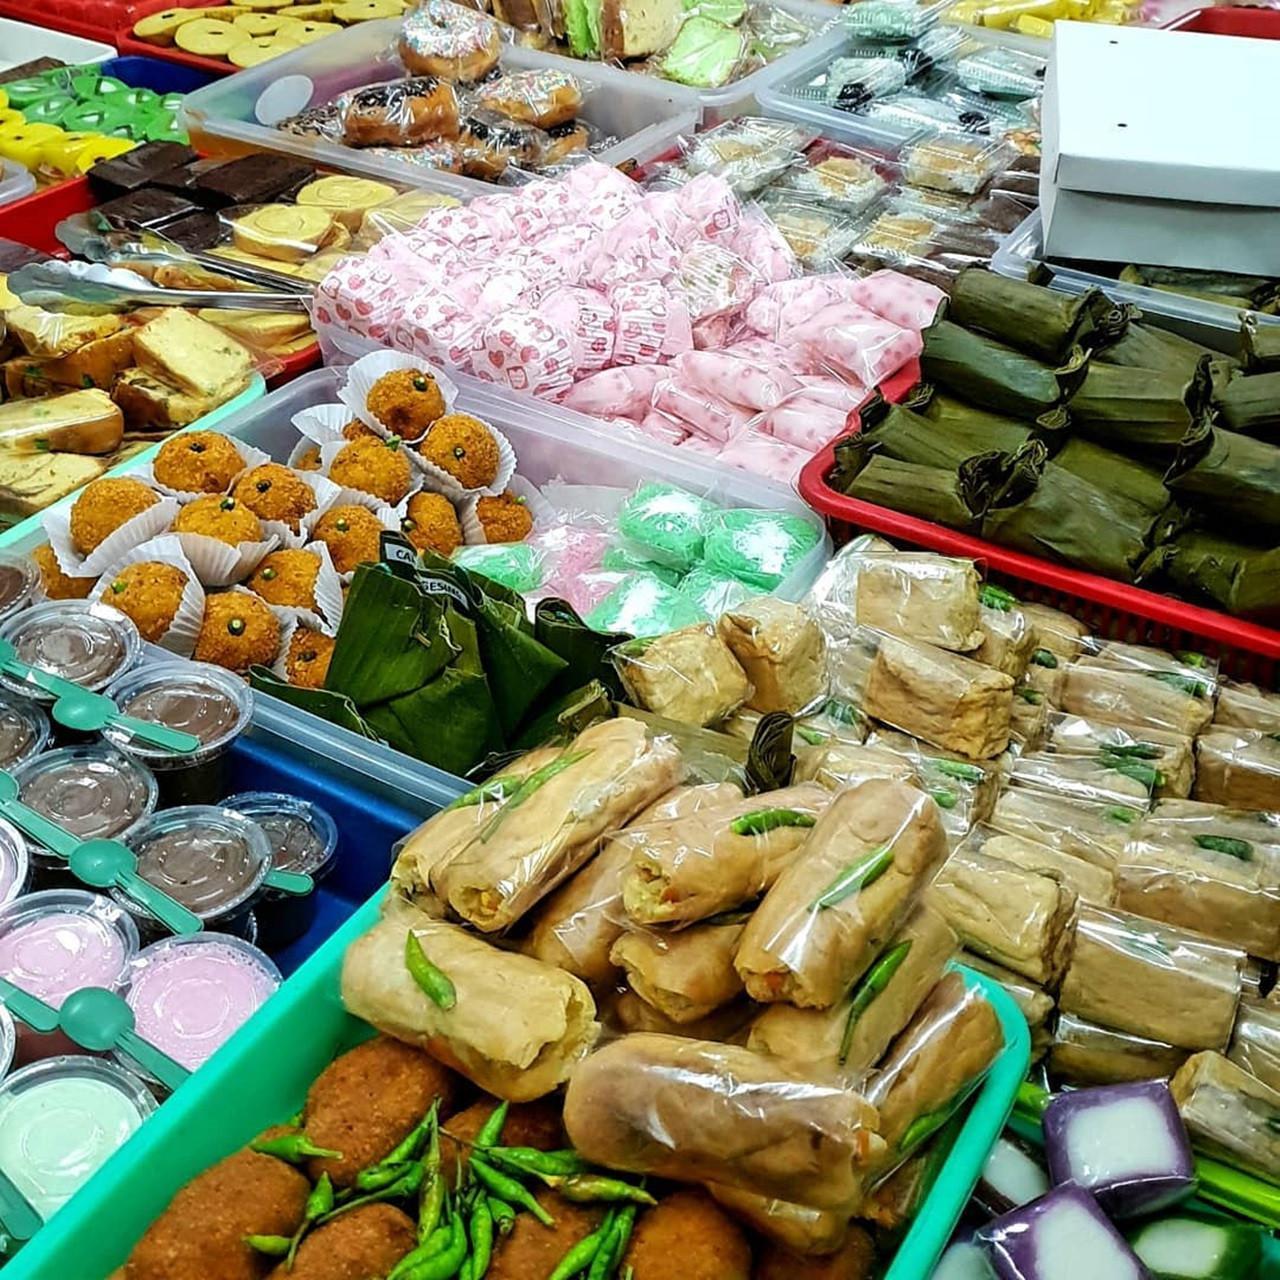 Jajanan pasar di Pasar Kranggan, Yogyakarta. (dok. Instagram @fatikwijaya/https://www.instagram.com/p/BrGwvVoFHNB/)